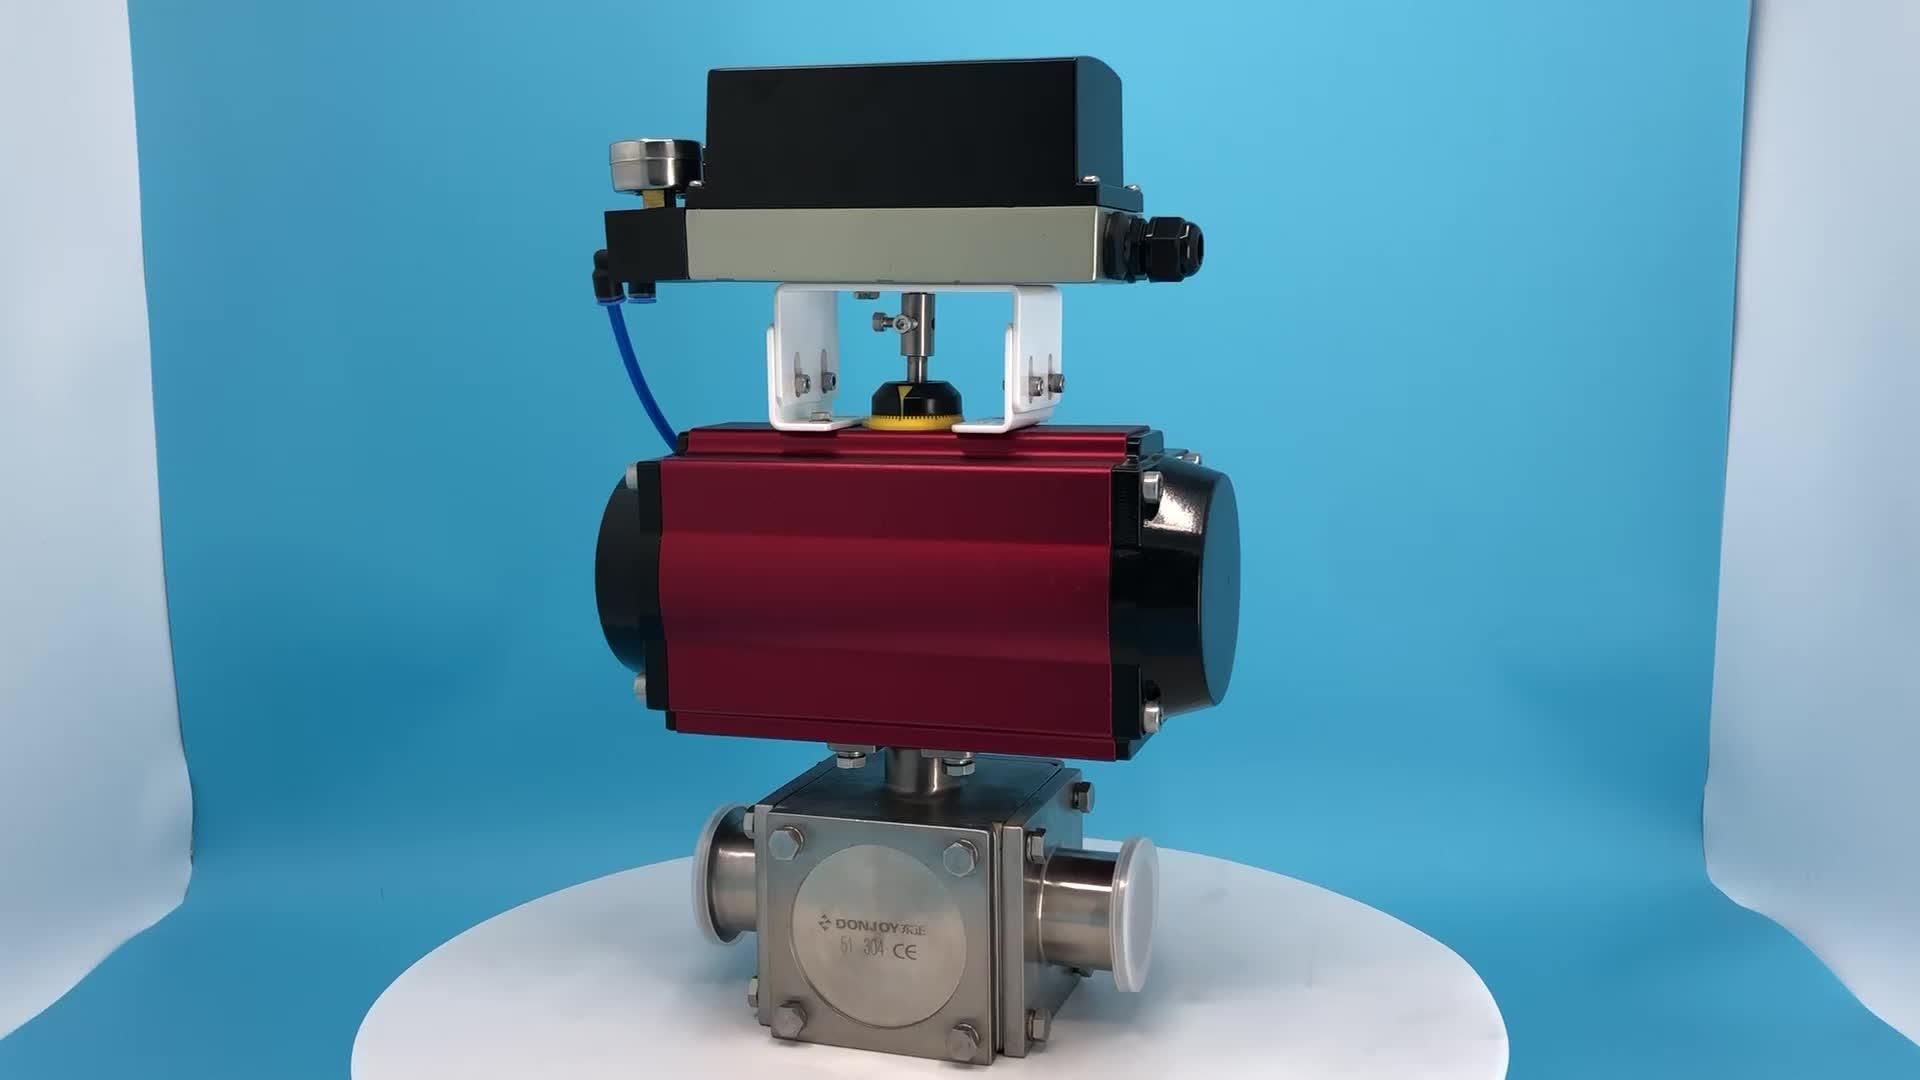 DONJOY Stainless steel sanitary Horizontal Pneumatic actuators